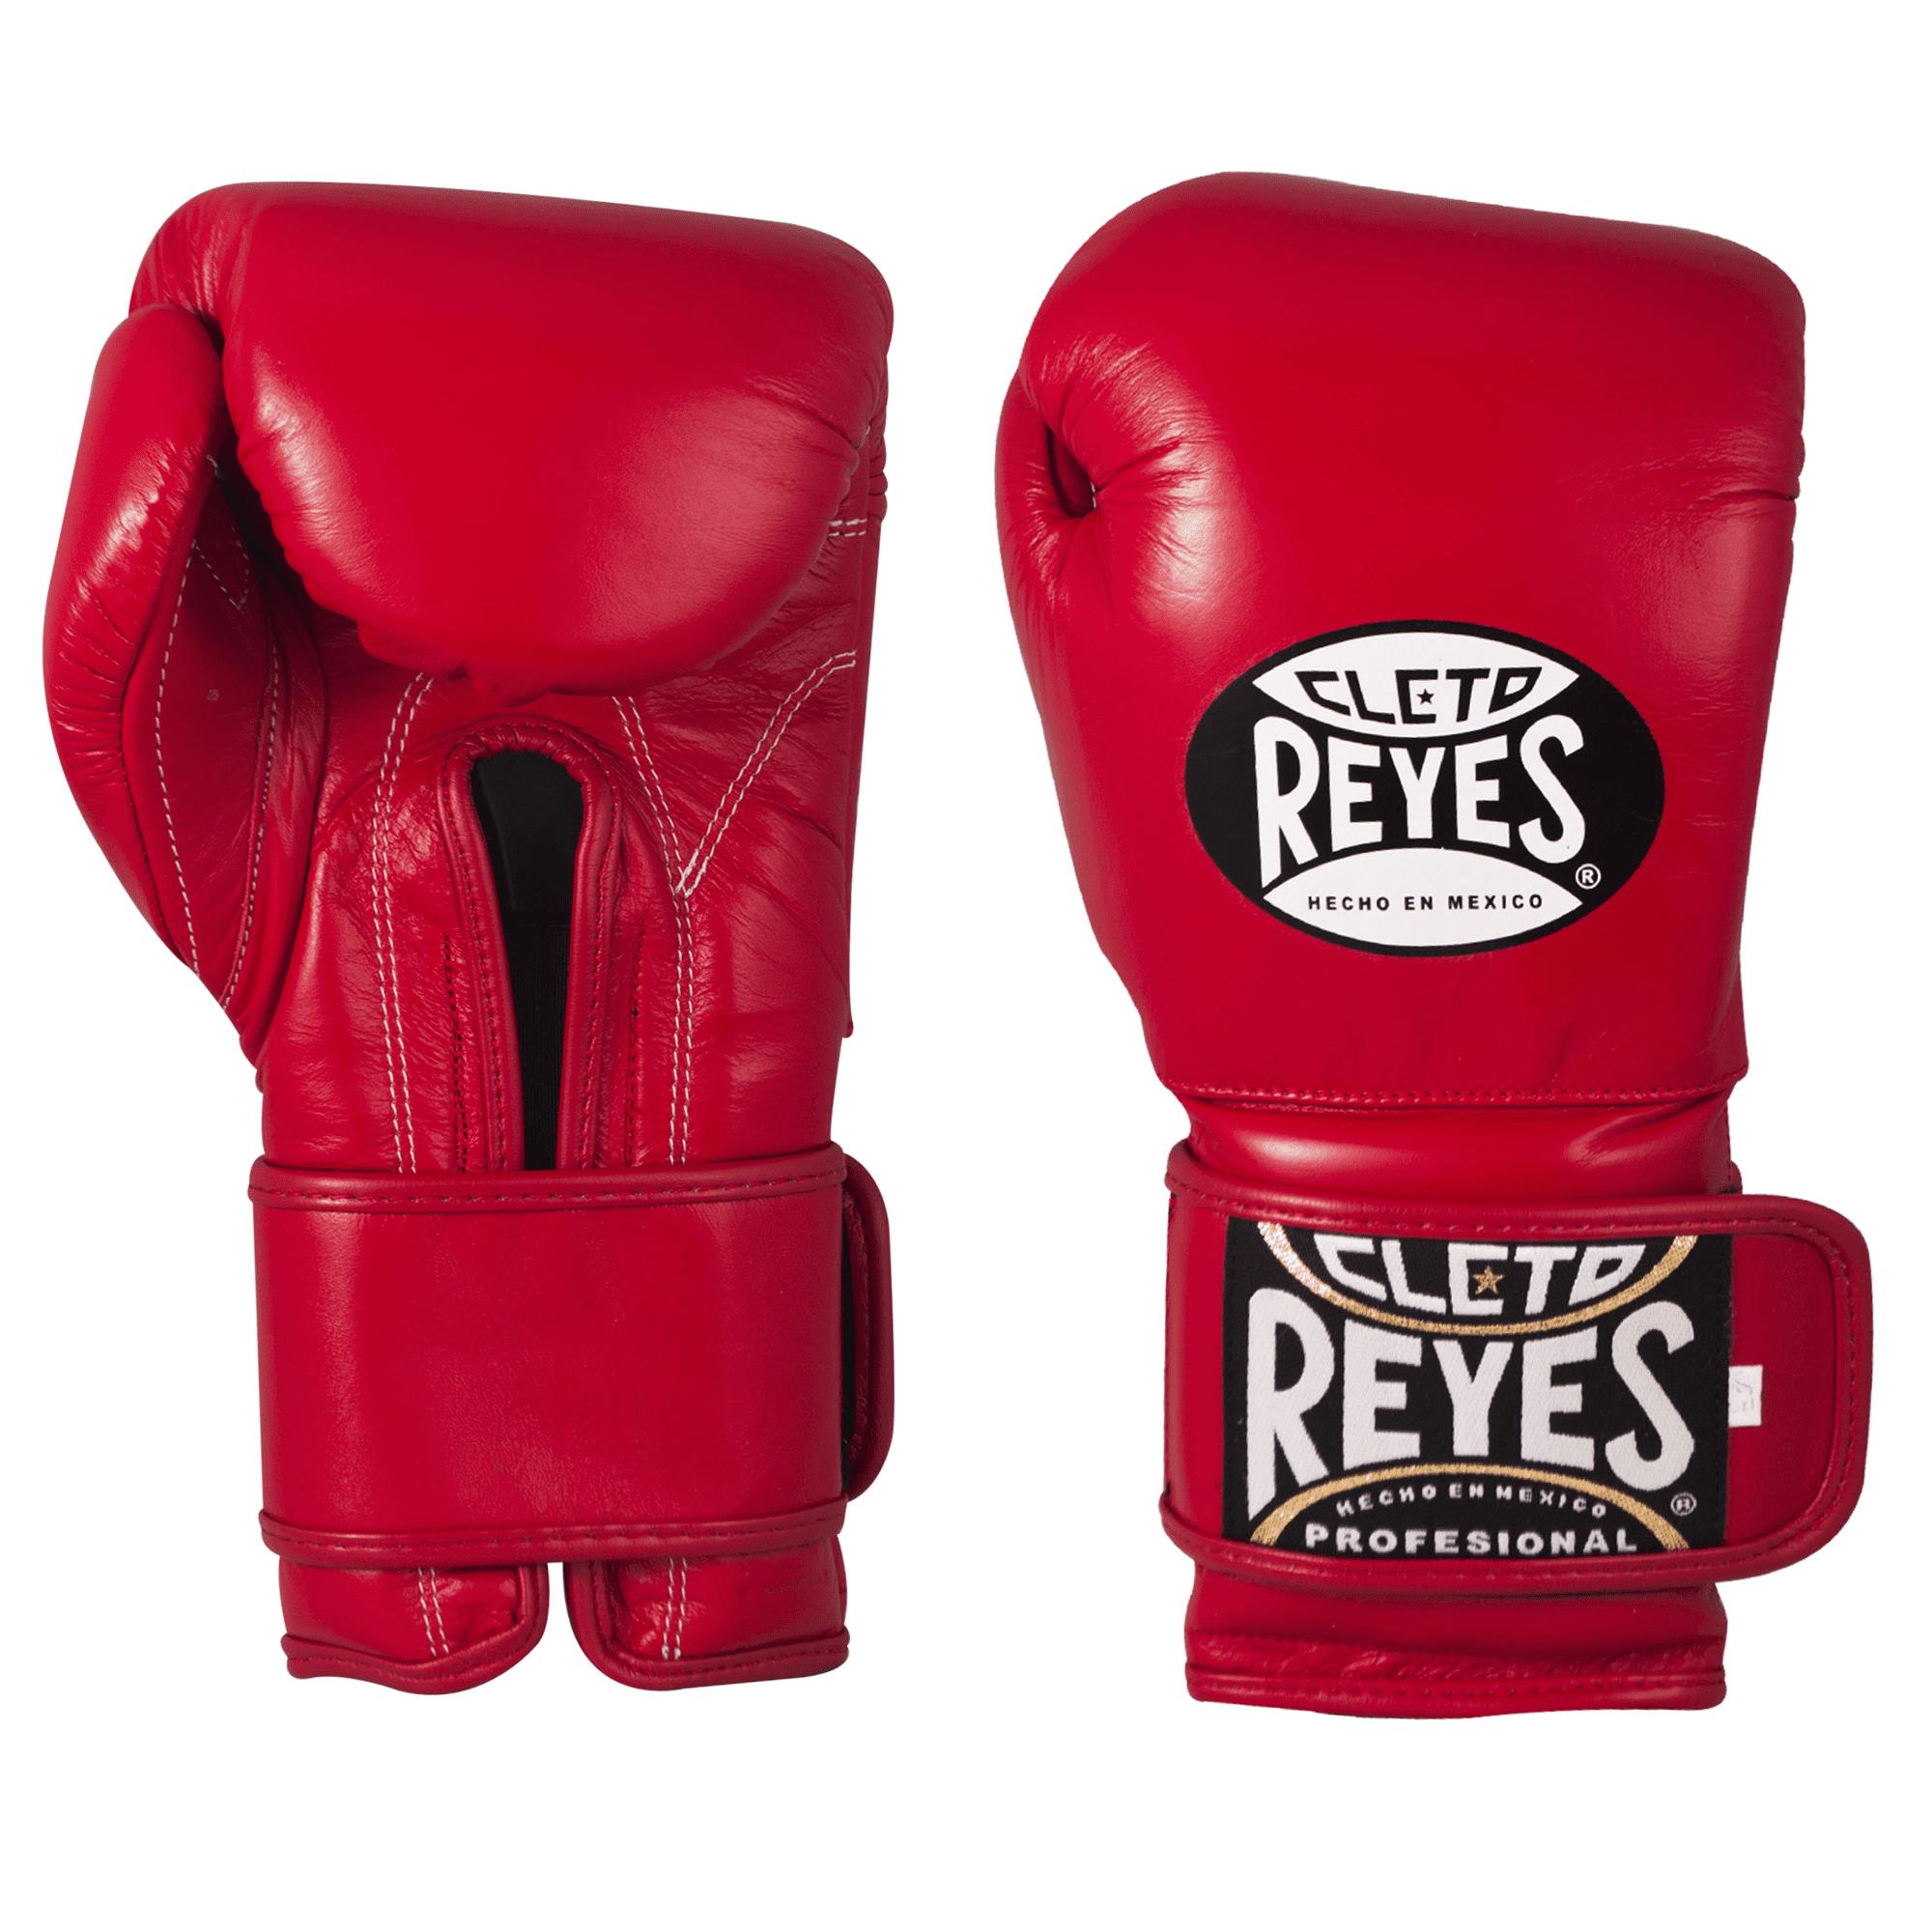 Cleto Reyes Training Boxing Gloves